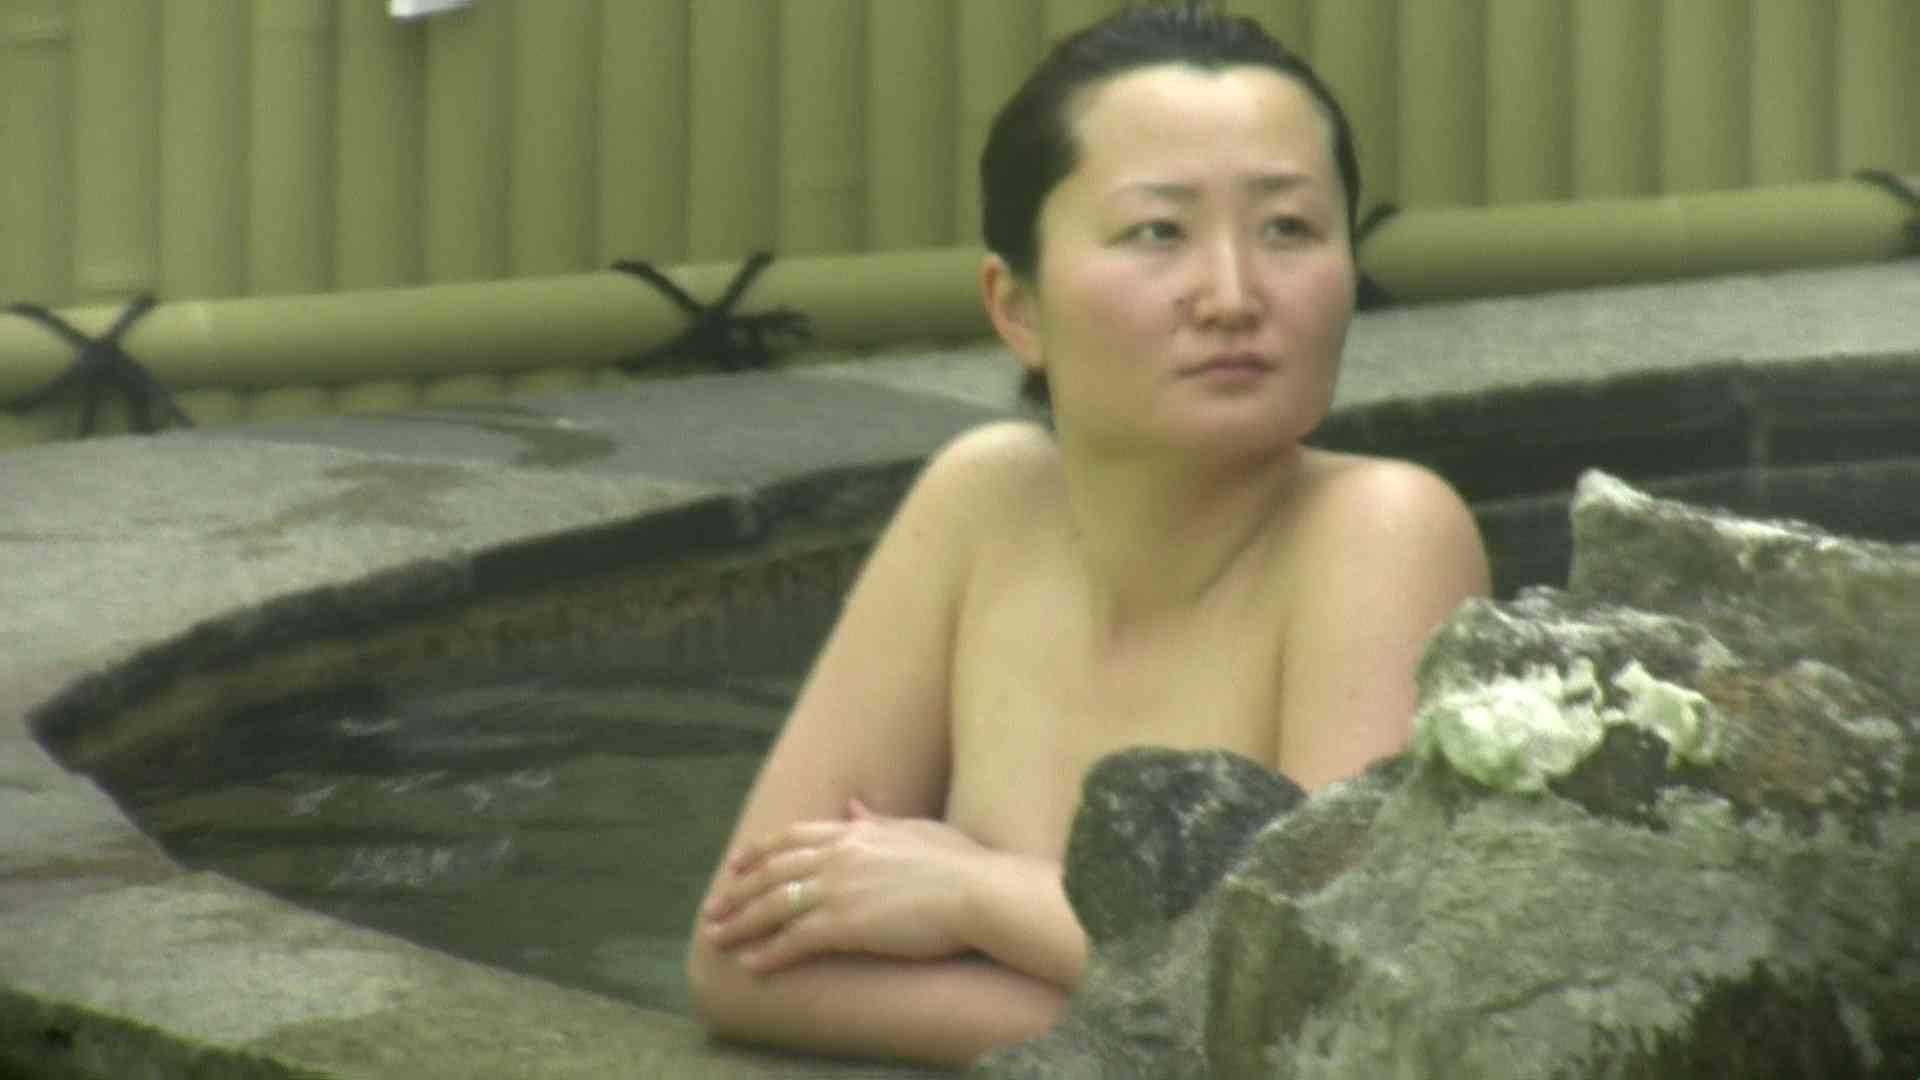 Aquaな露天風呂Vol.632 盗撮 | OLセックス  70画像 49